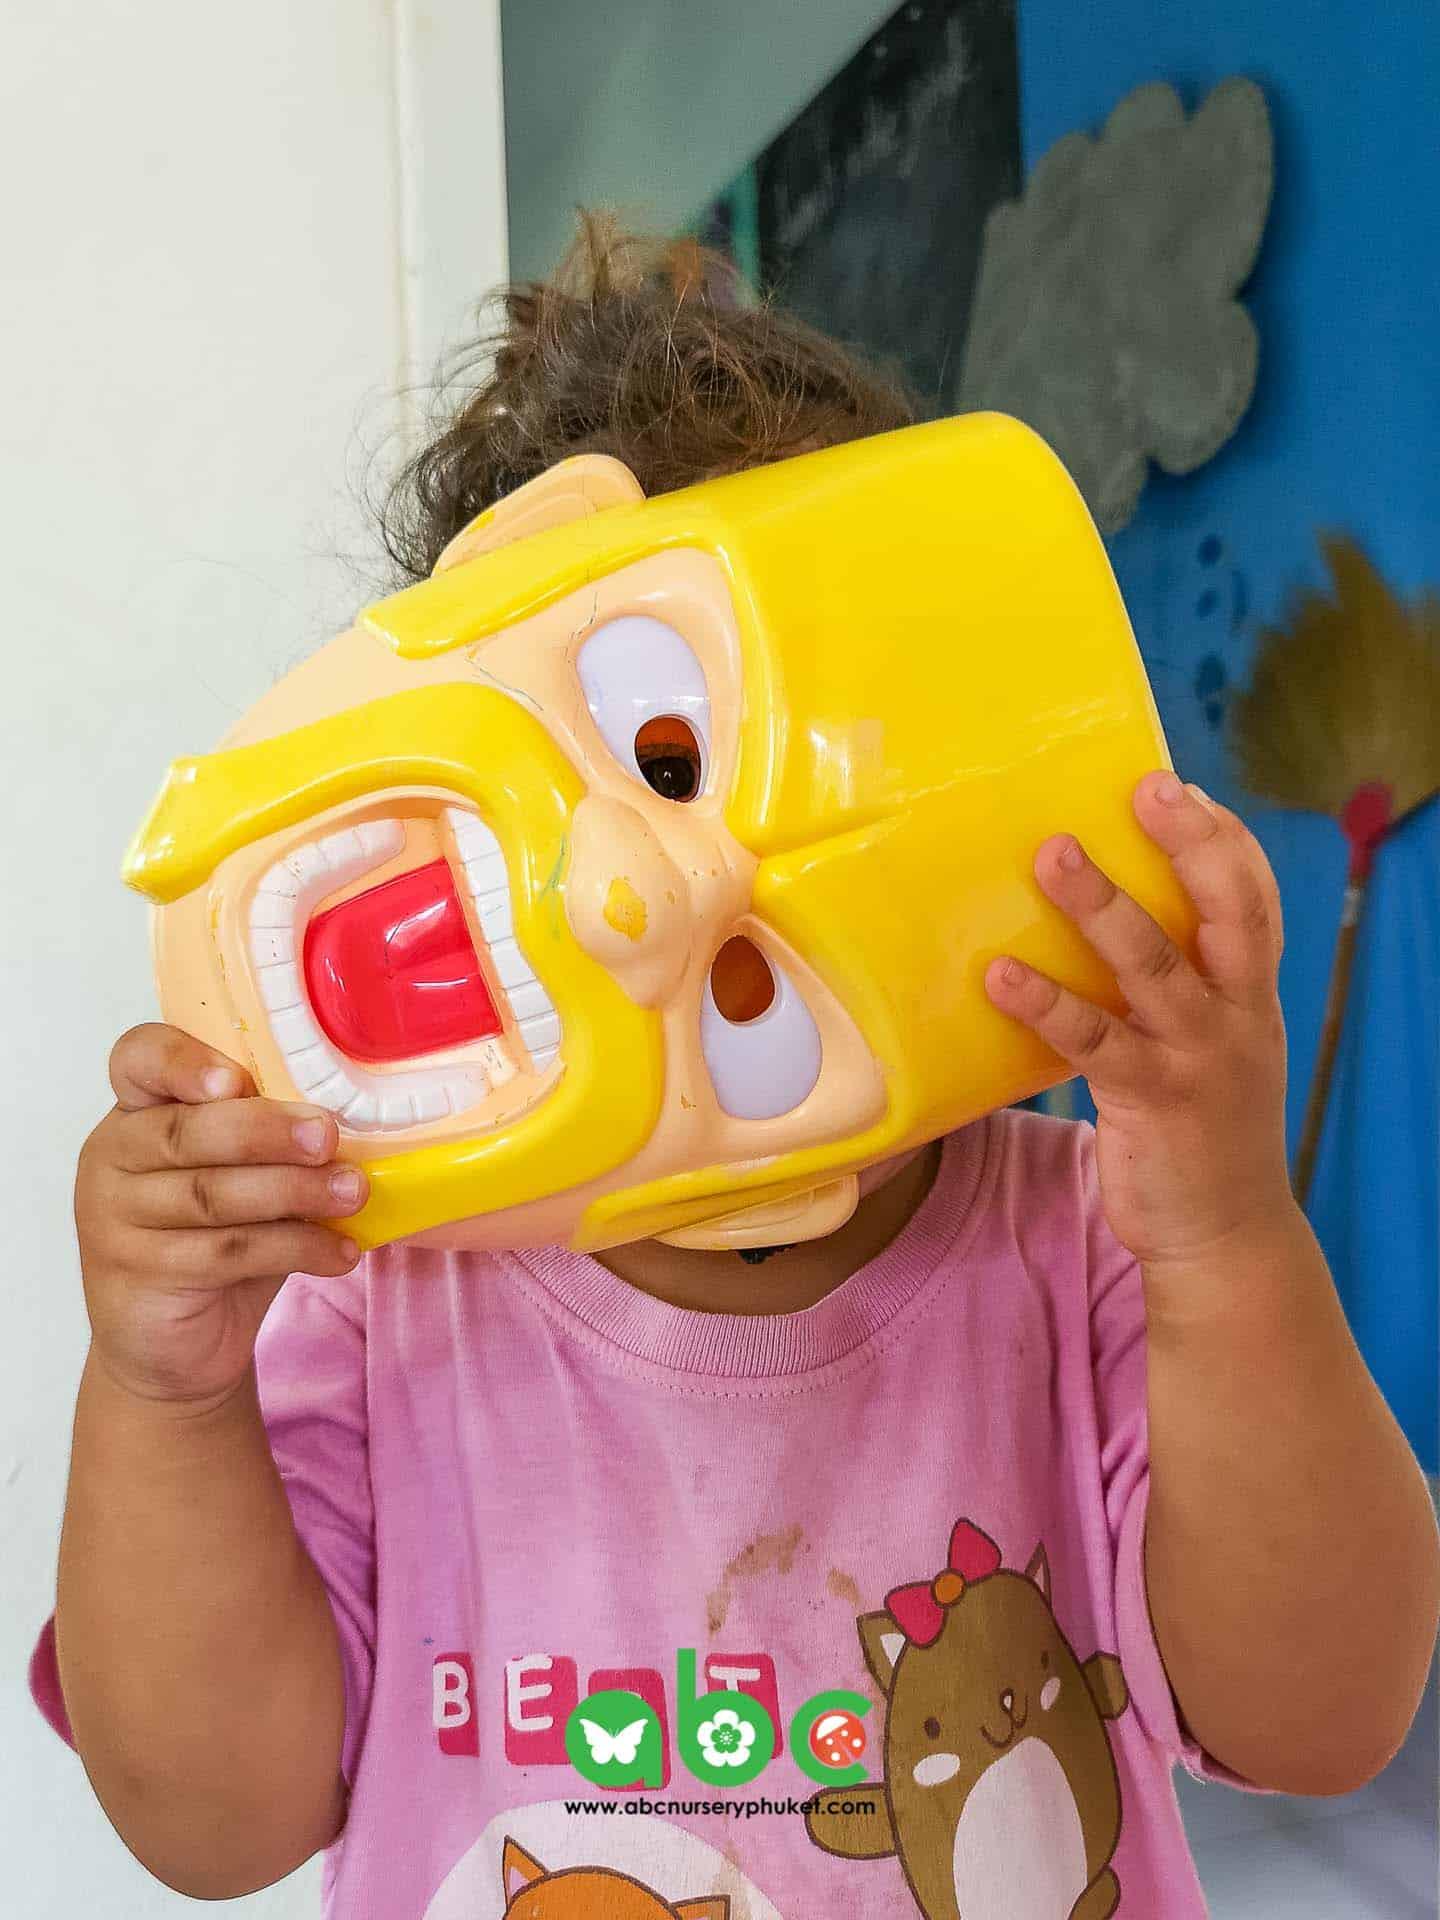 ABC Nursery, Kindergarten & Pre-School - English